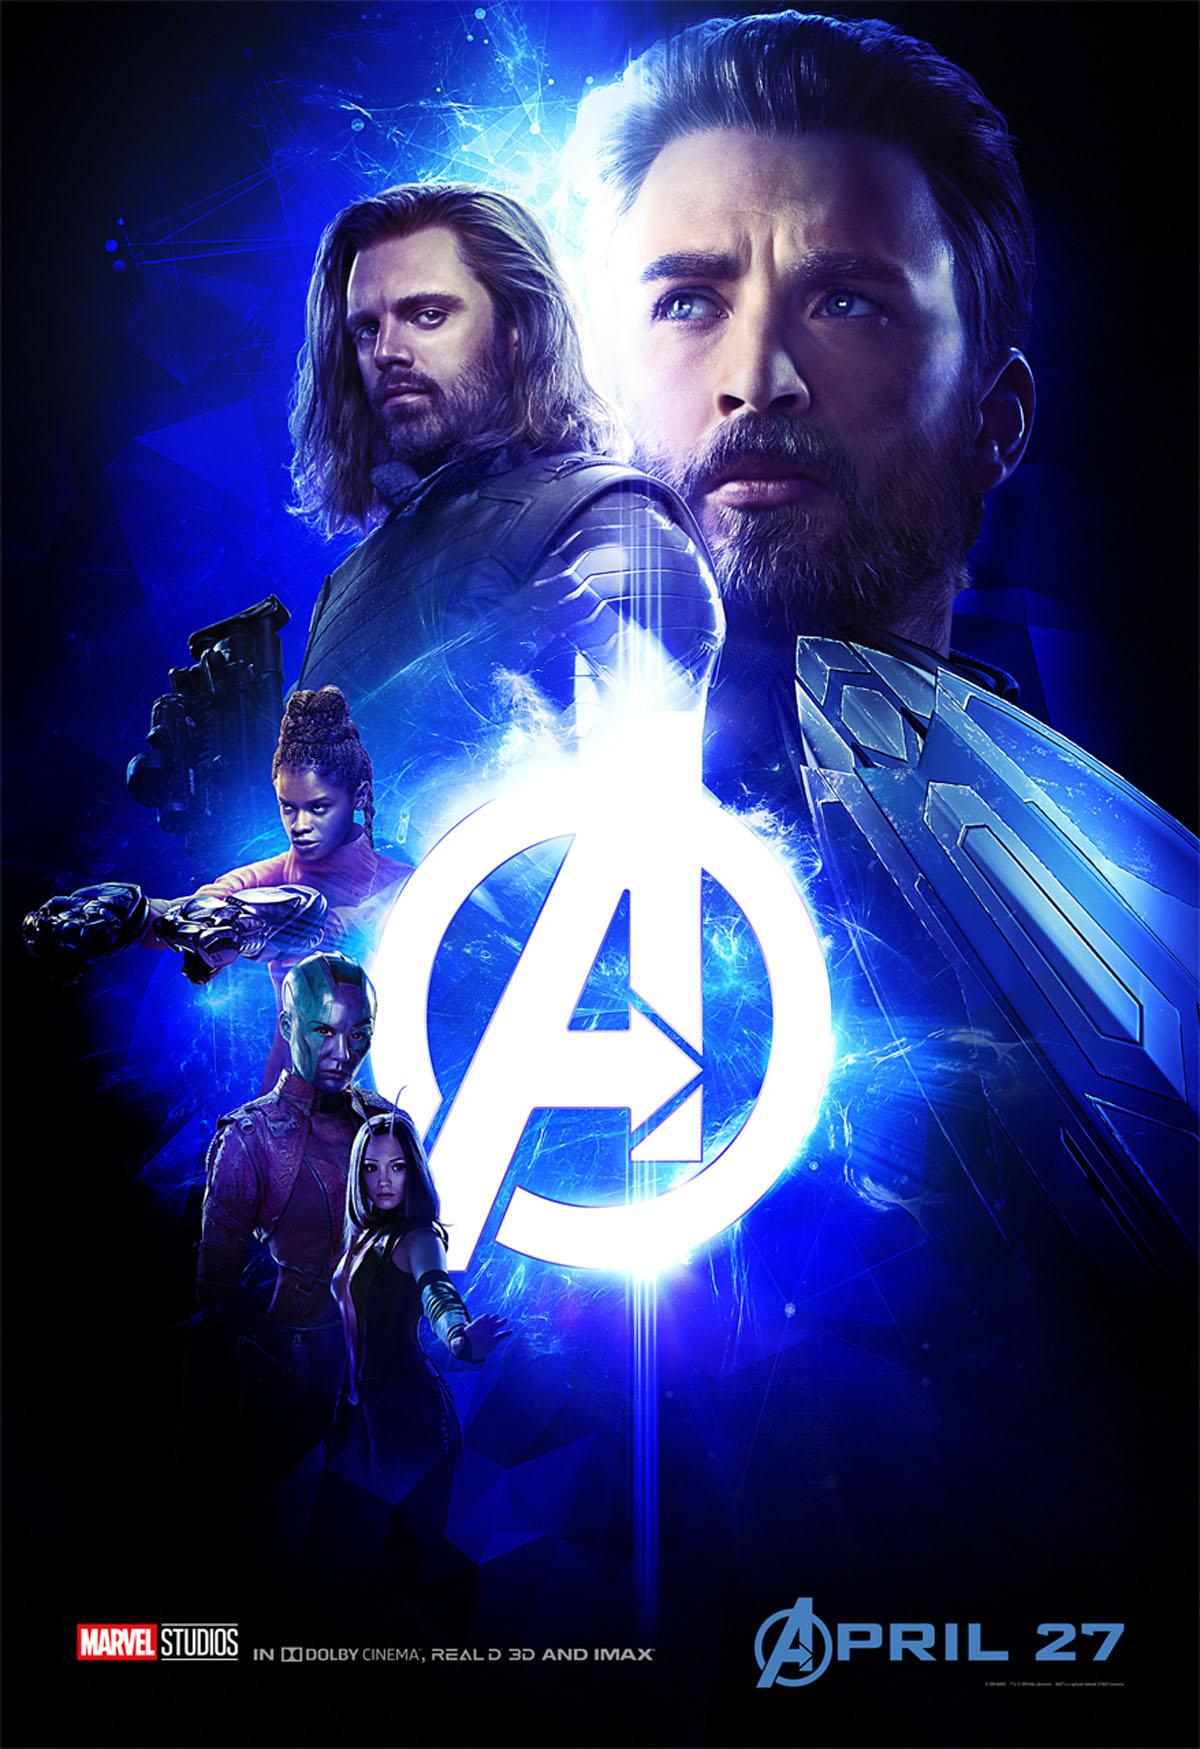 szmk_marvel_avengers_infinity_war_bosszuallok_vegtelen_haboru_thanos_vasember_hulk_thor_spiderman_ironman_amerika_kapitany_4.jpg